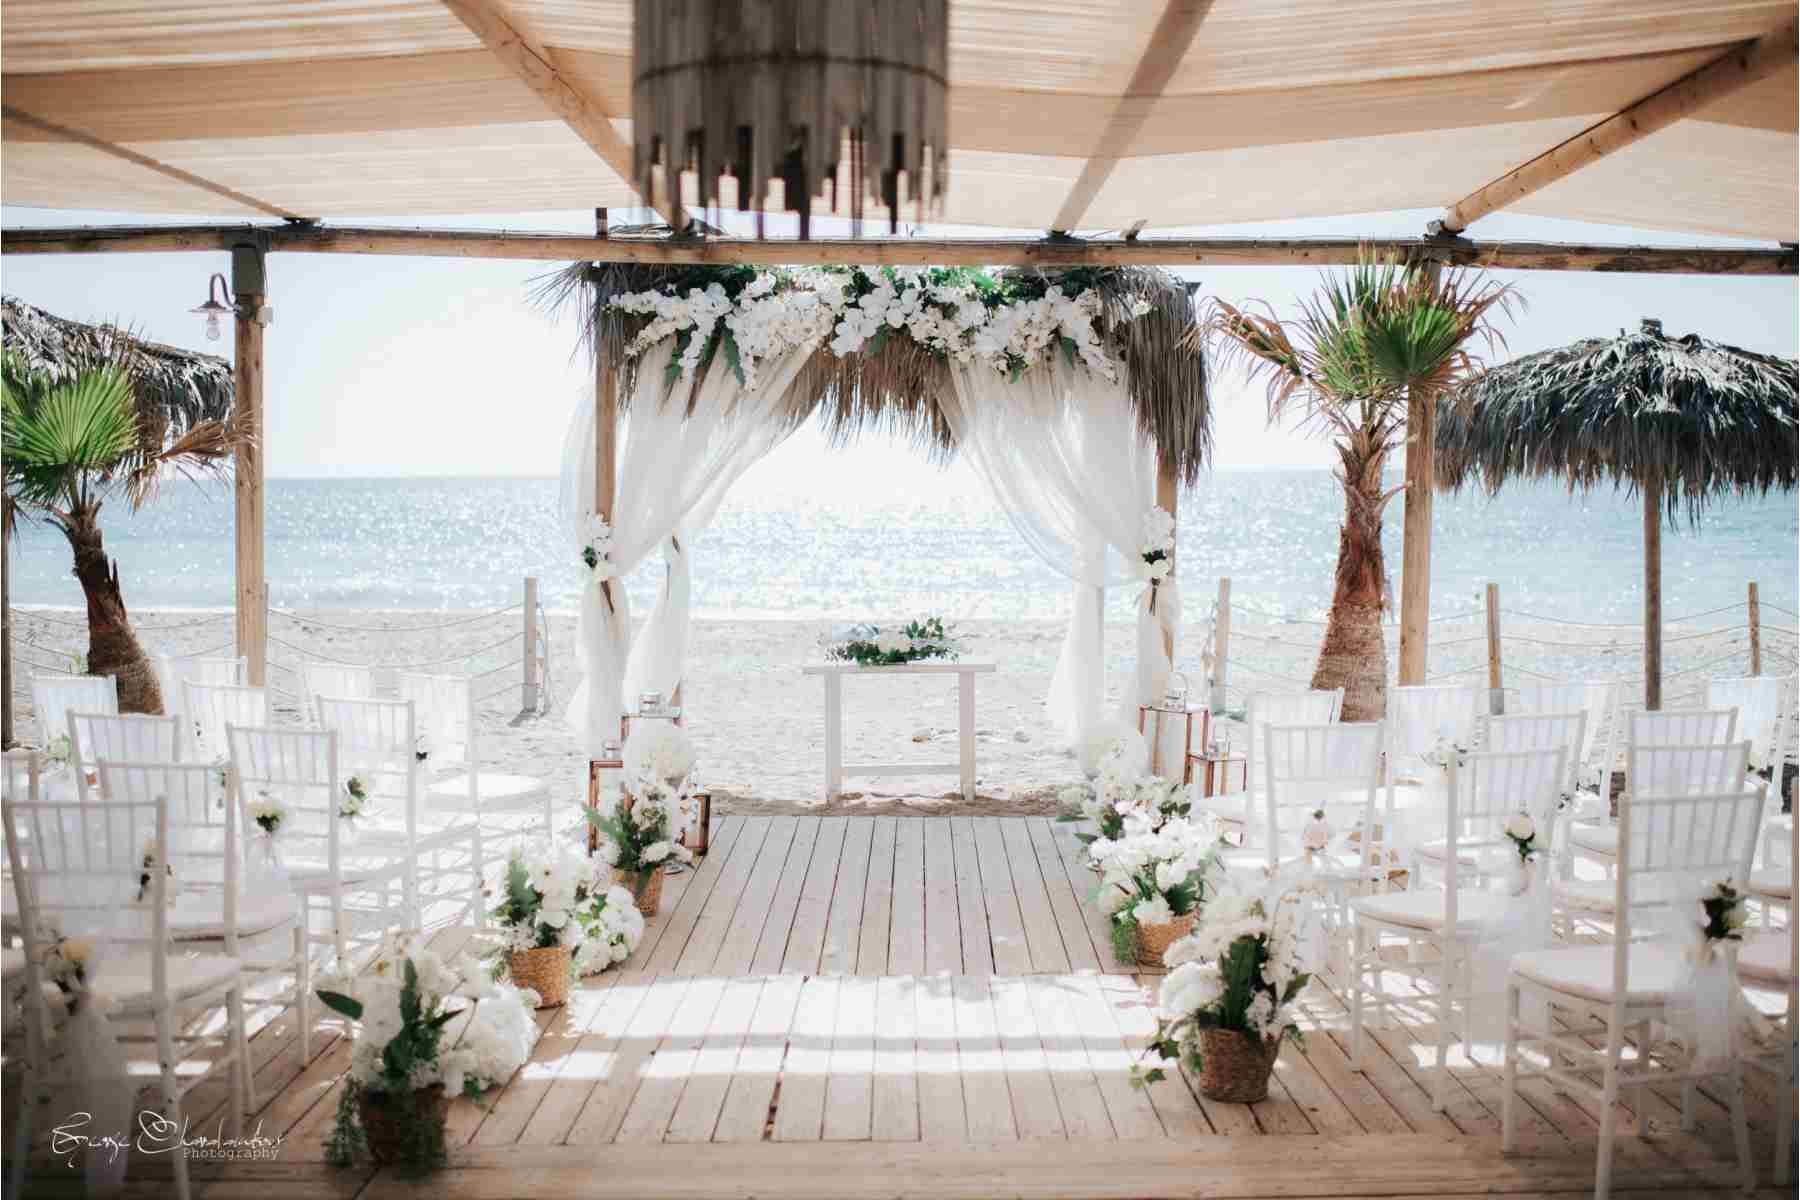 Beach wedding in Cyprus Wedding Package